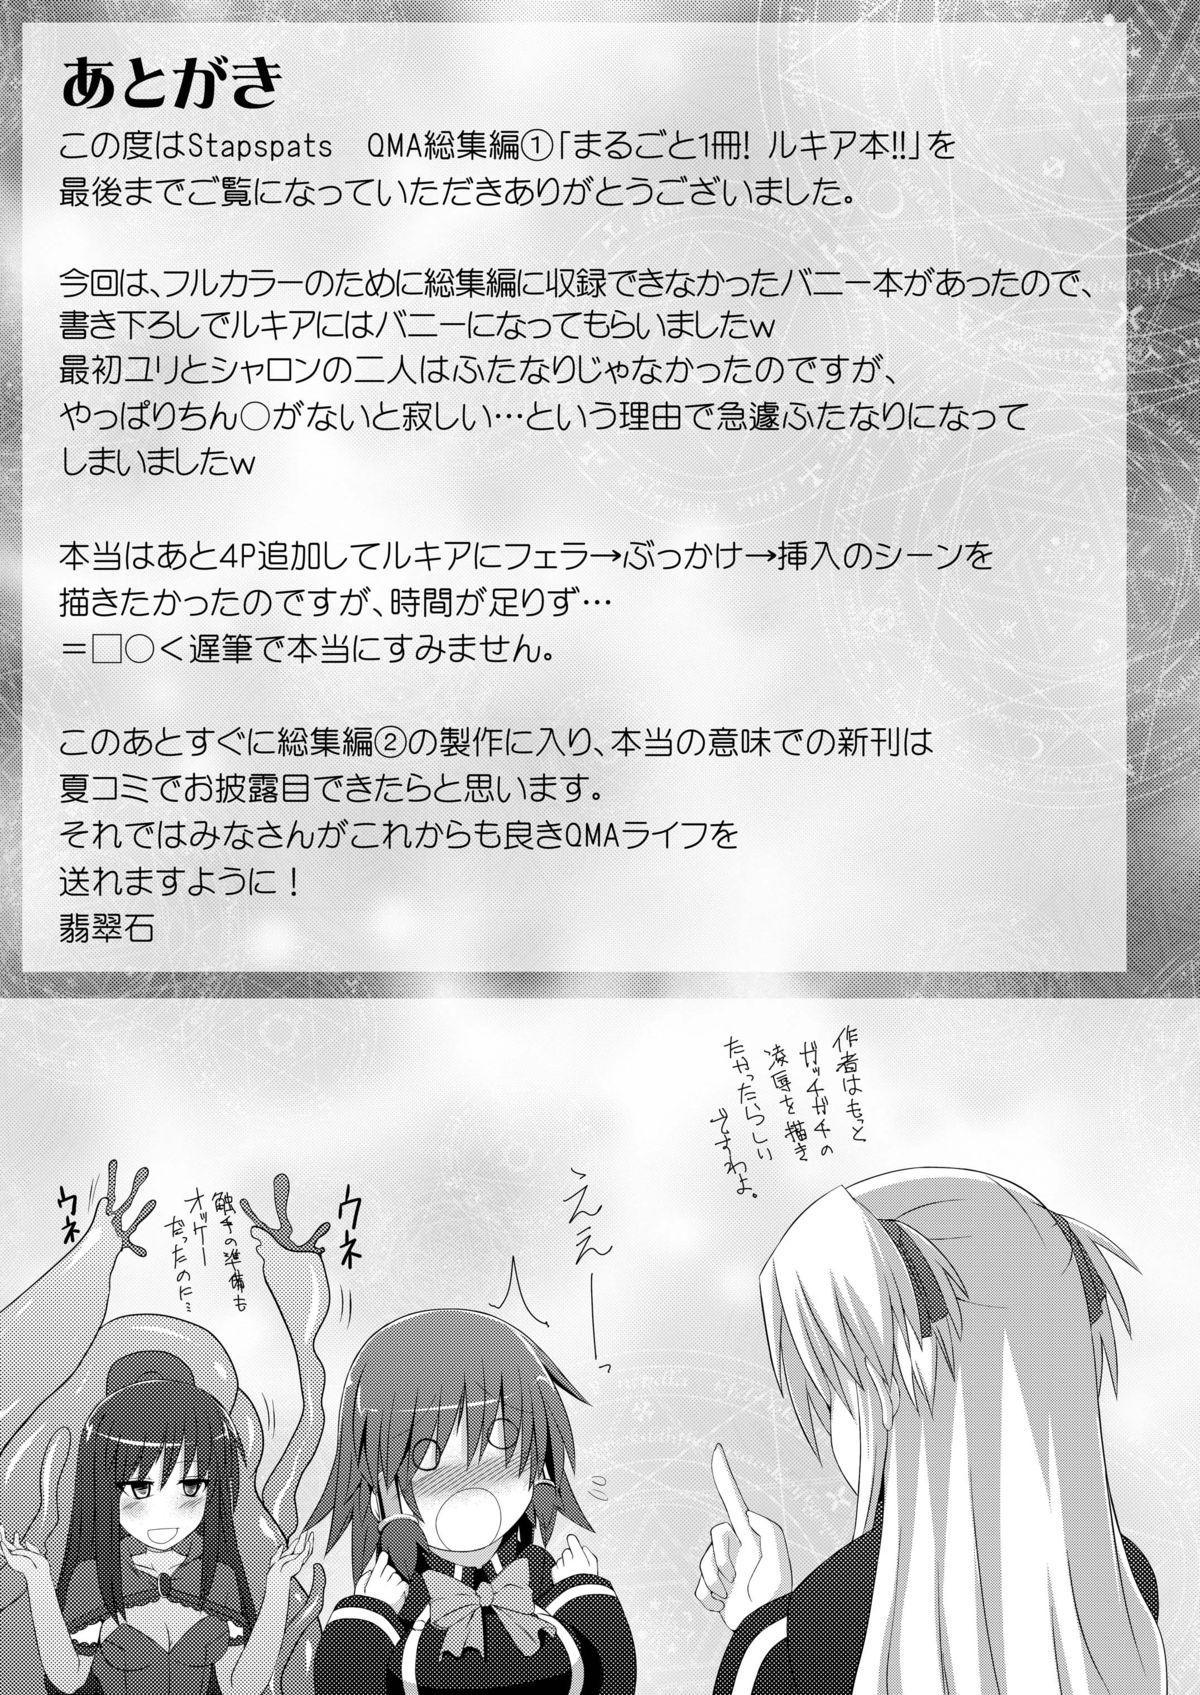 Stapspats QMA Soushuuhen 1: Marugoto Issatsu! Ruquia Hon!! 156